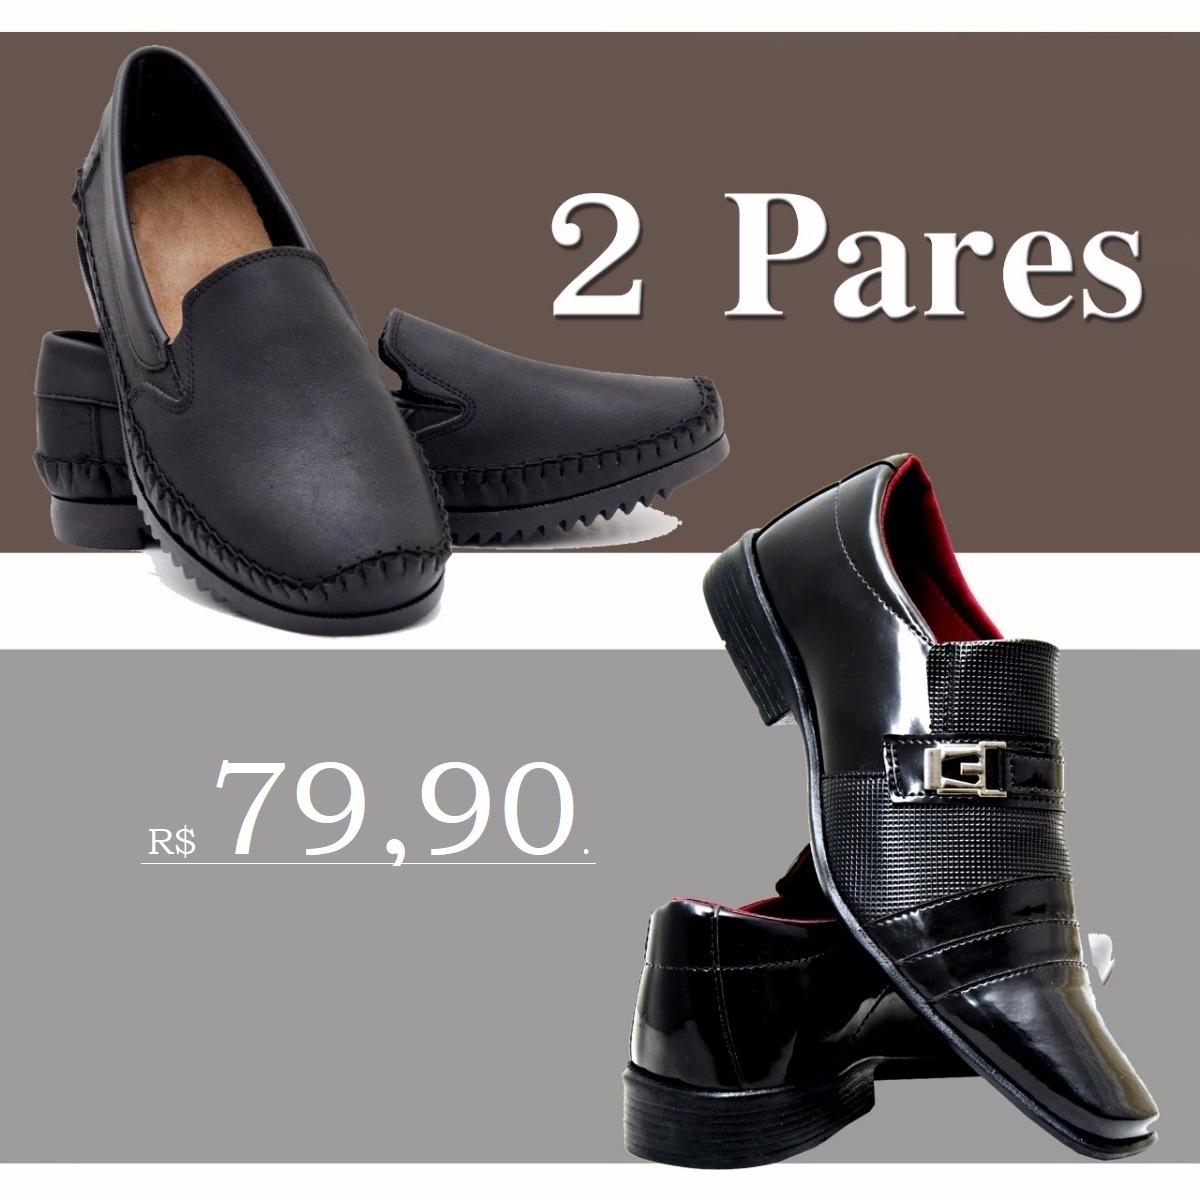 afde57144 kit sapato social masculino verniz+sapatilha couro legítimo. Carregando  zoom.